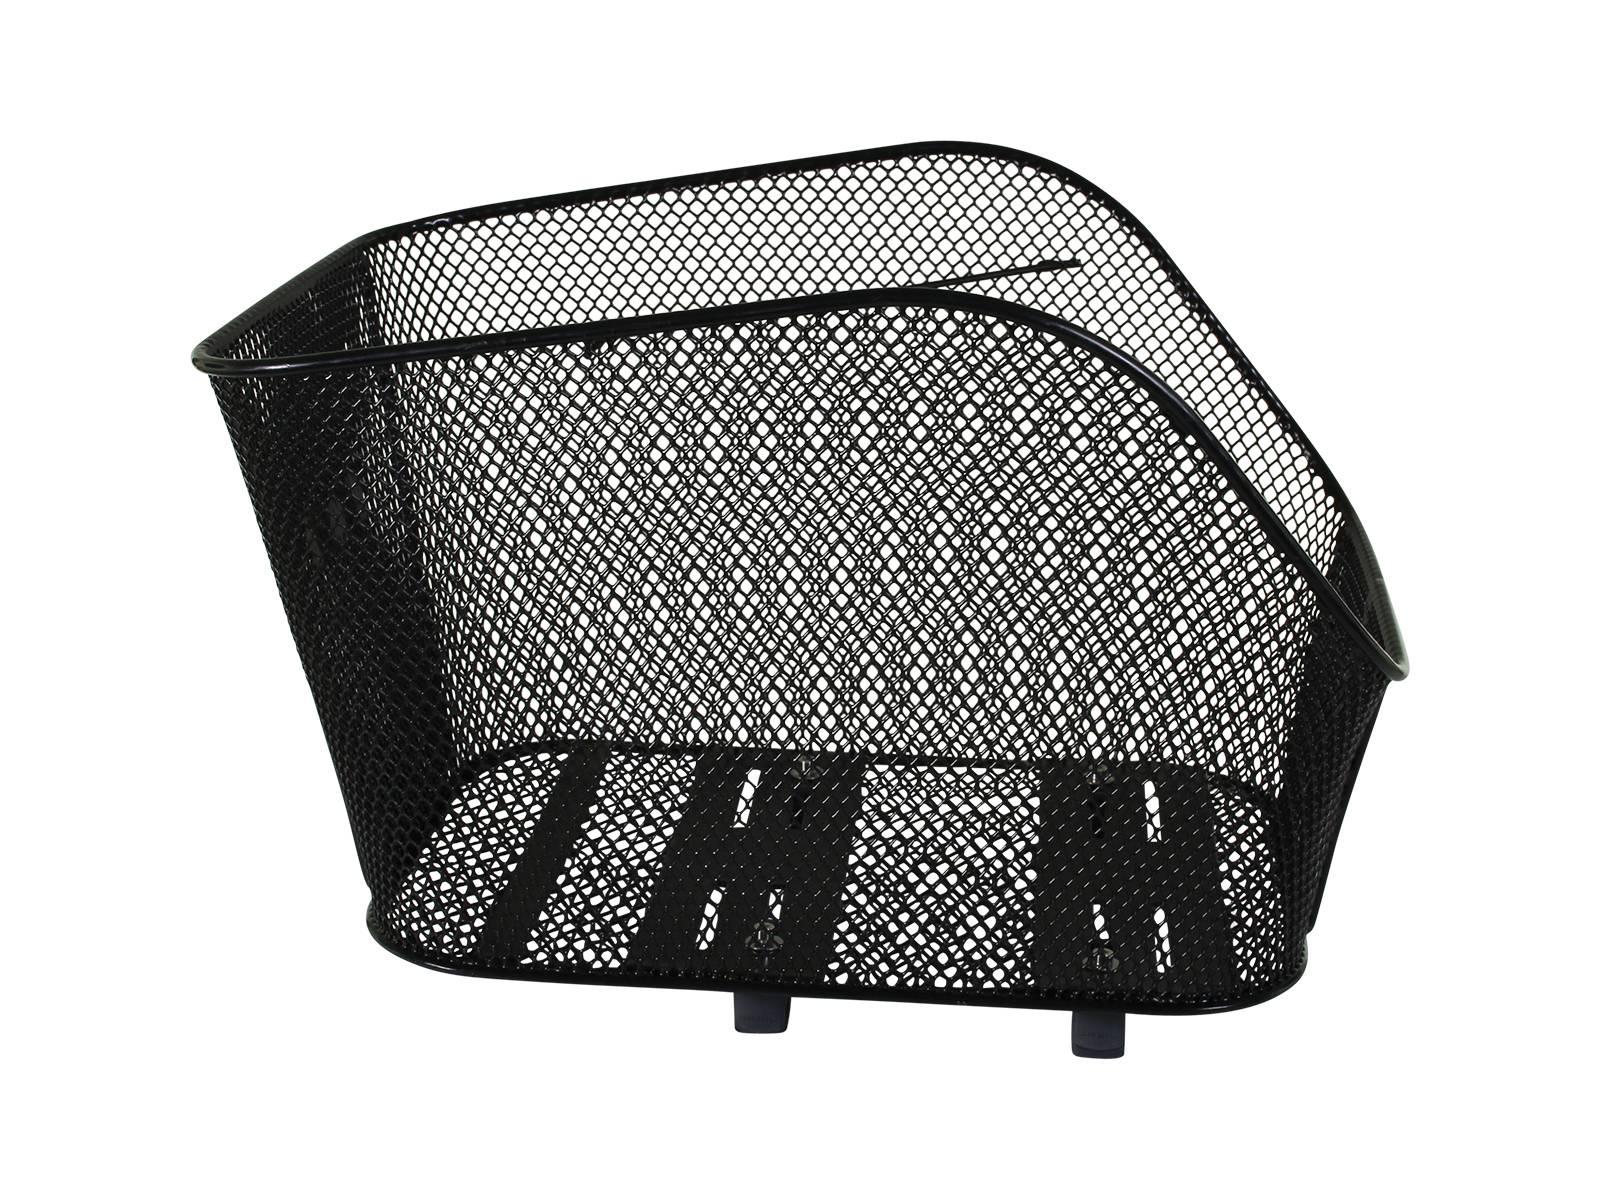 fahrradkorb hund hinten best fahrradkorb hund hinten with. Black Bedroom Furniture Sets. Home Design Ideas